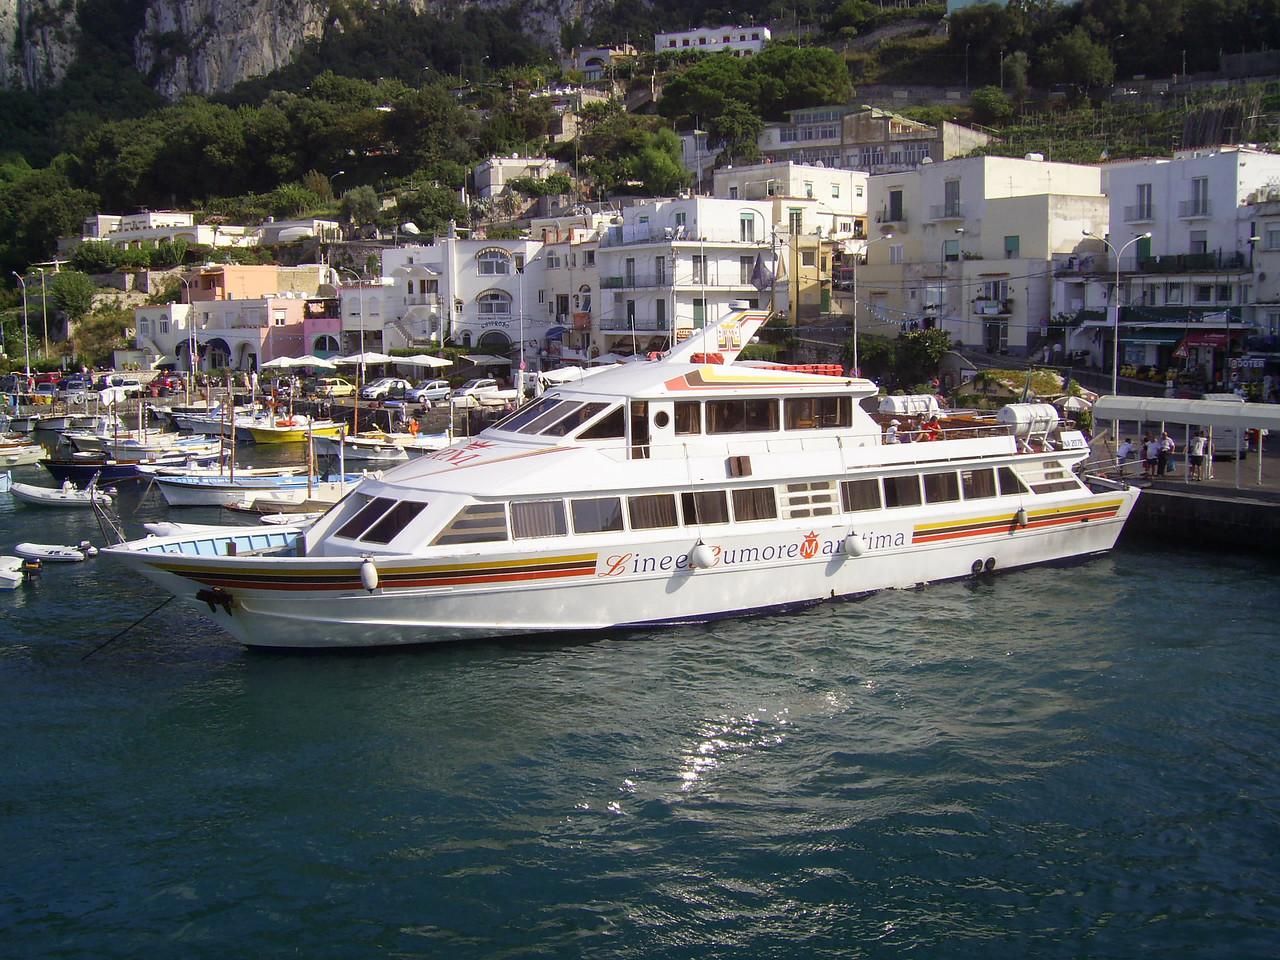 2010 - M/V ISCHIA PRONCESS in Capri.